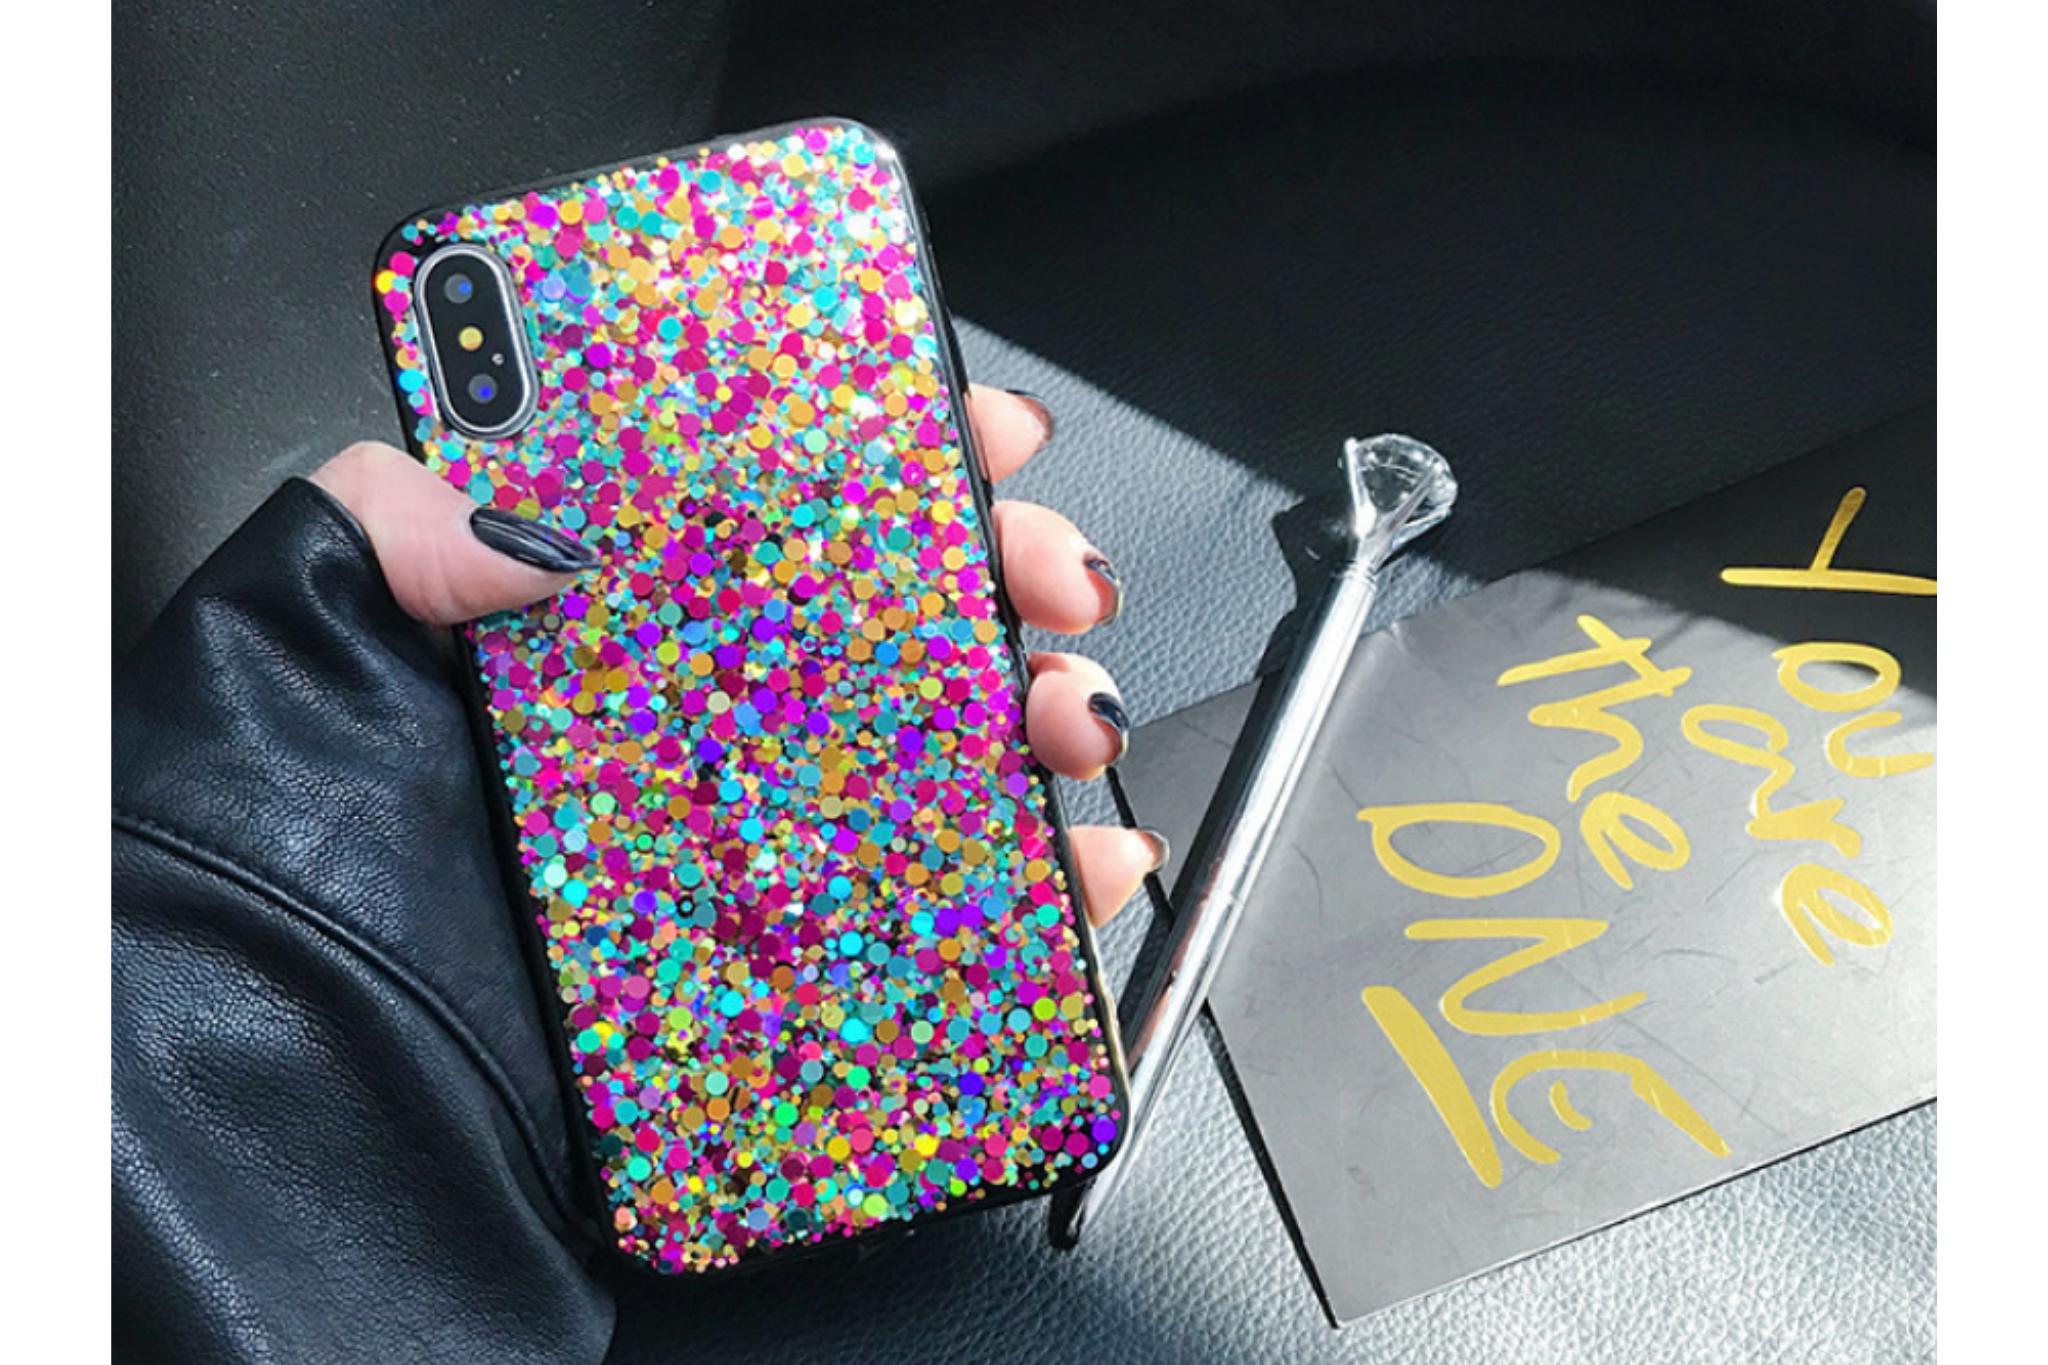 Smartphonehoesje iPhone 7 / 8  Plus | Bling met glitters | Multicolor